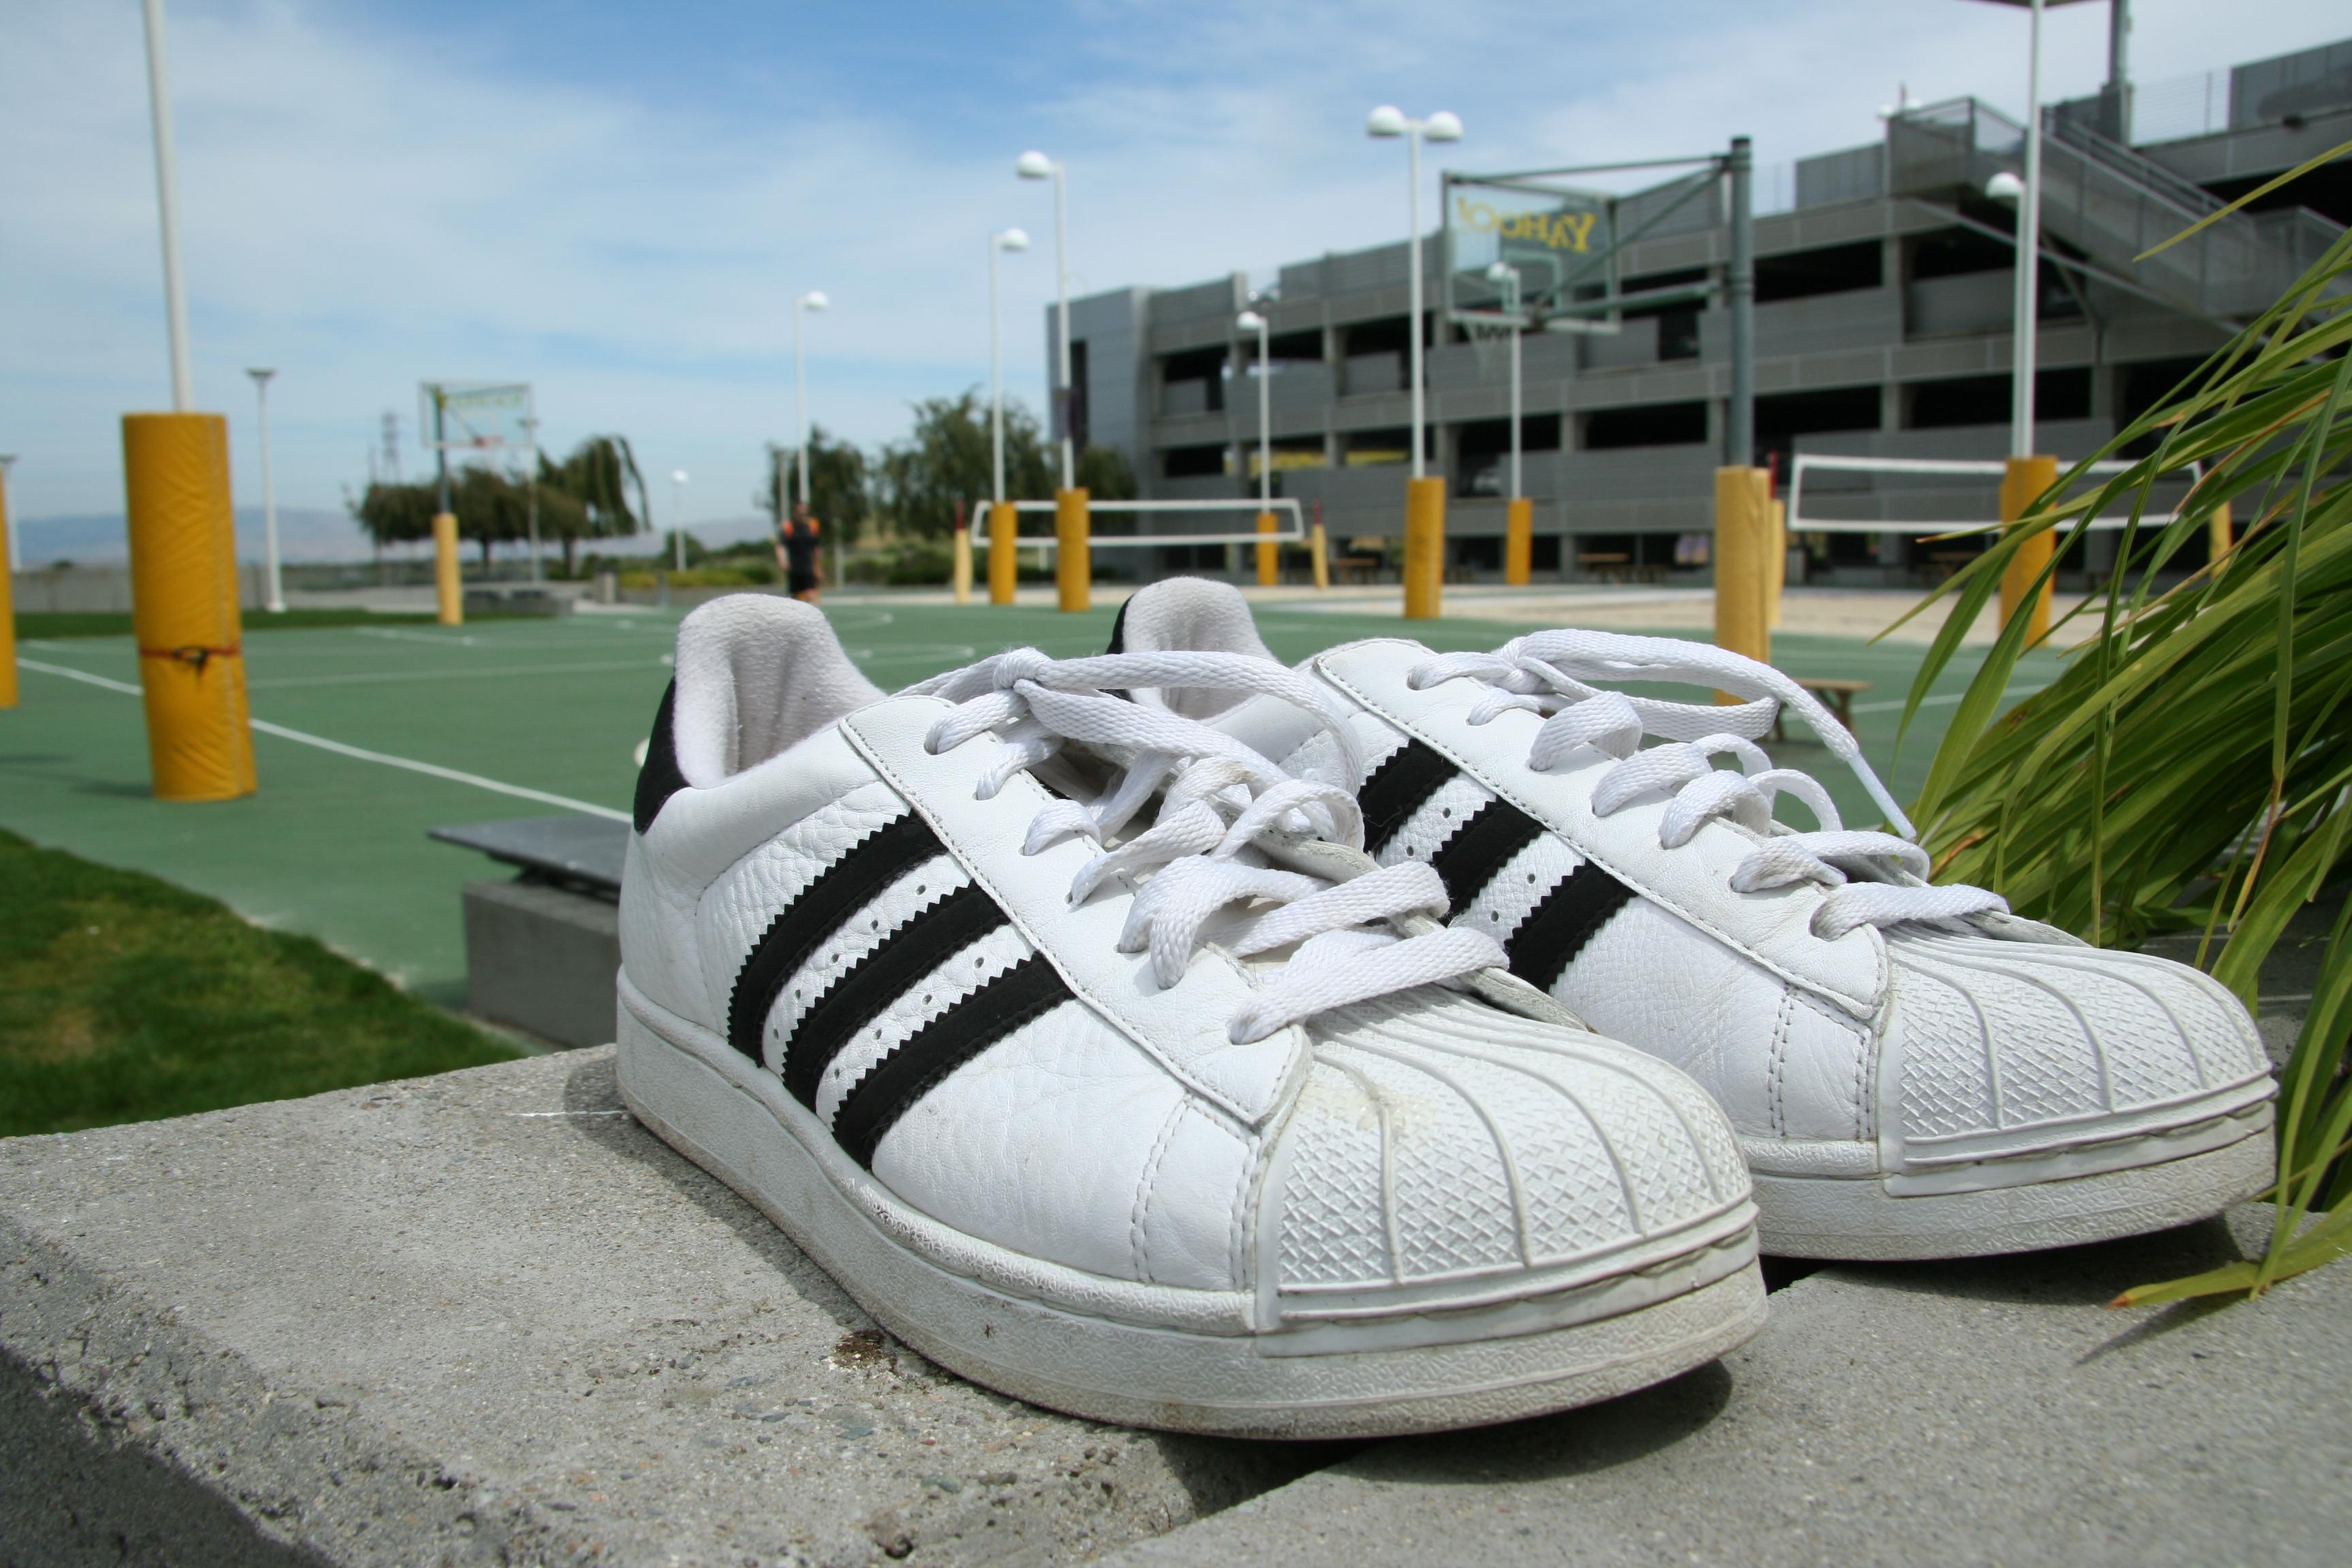 Adidas Superstar - это... Что такое Adidas Superstar? David Beckham